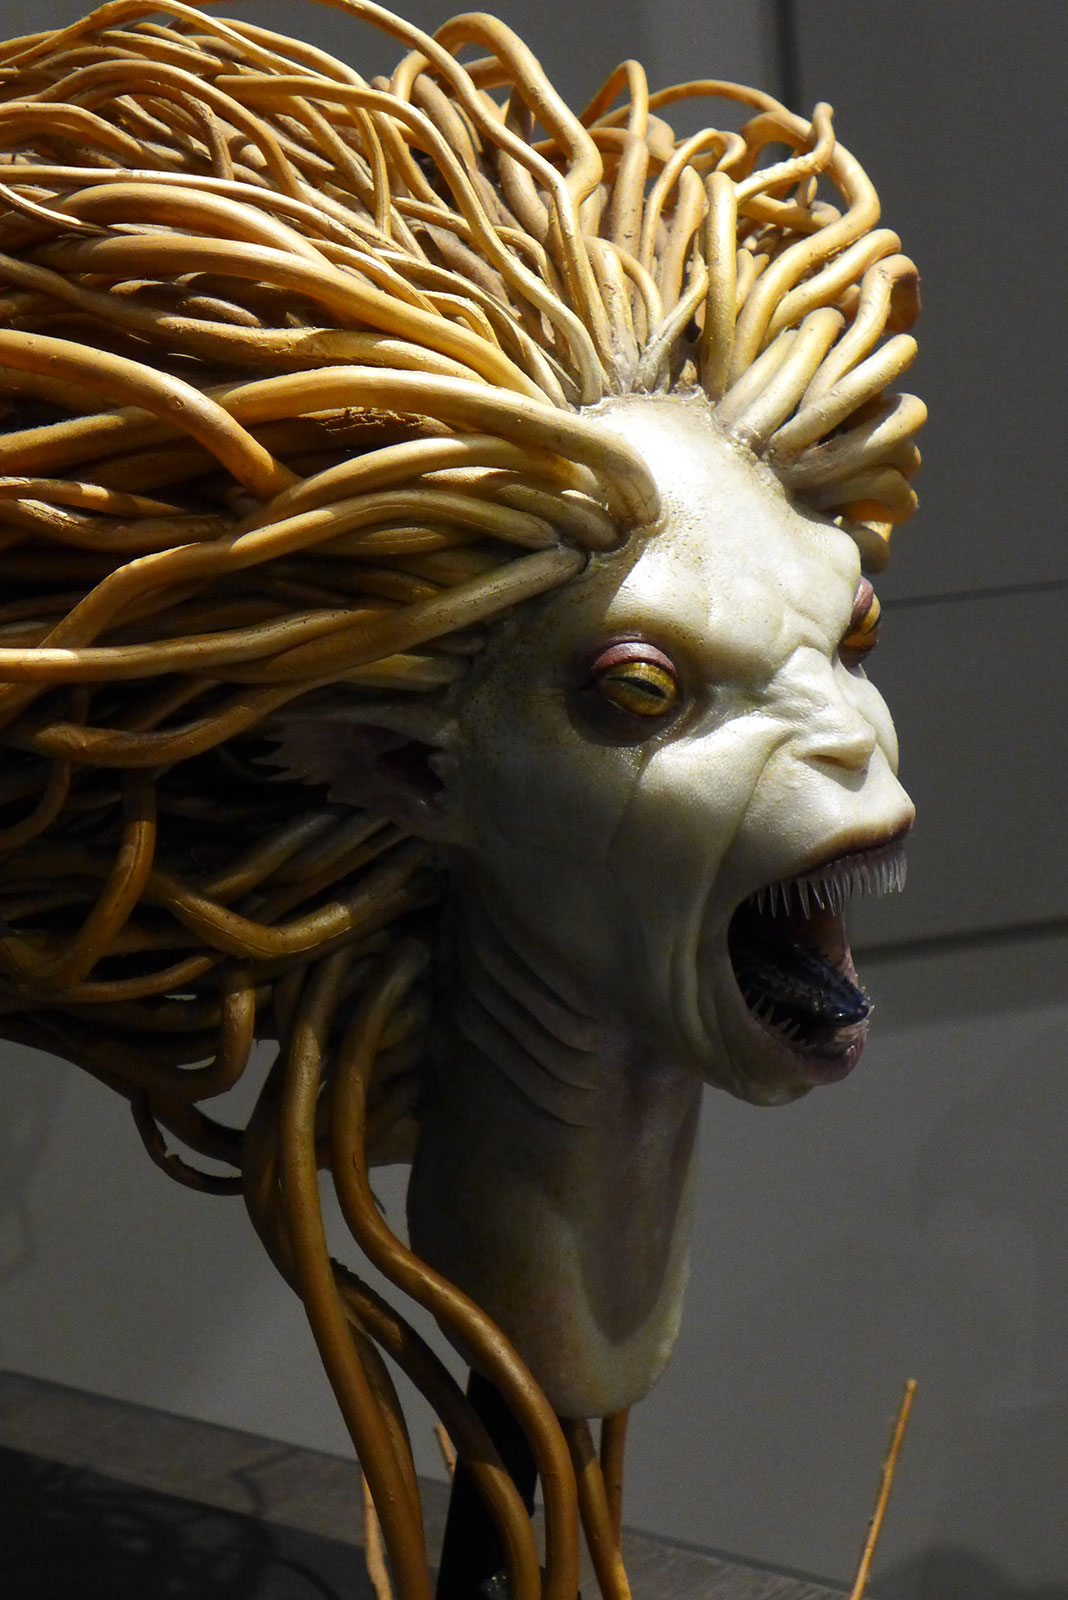 Mermaid head